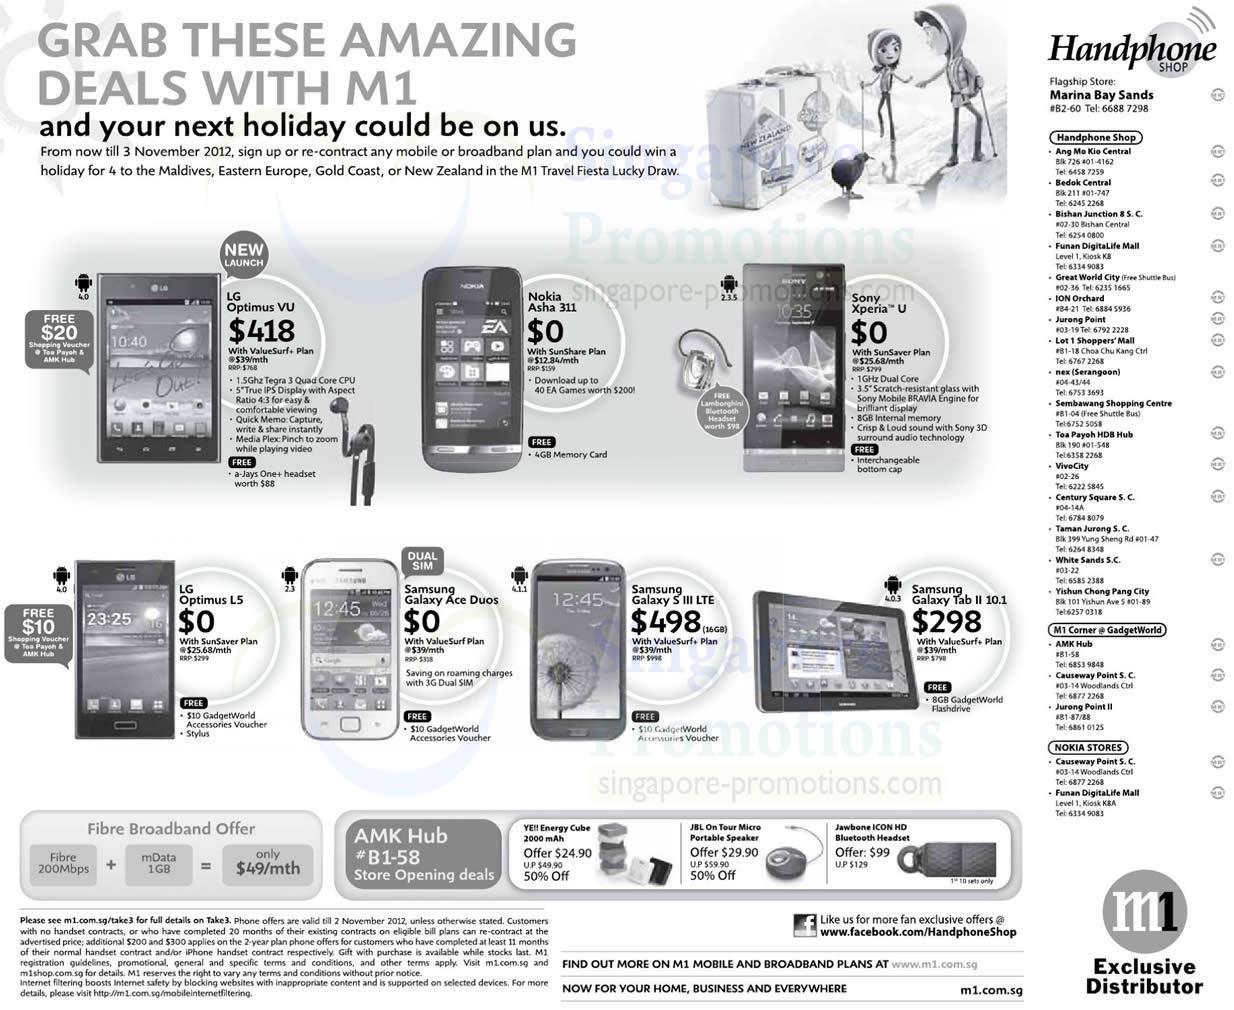 Handphone Shop LG Optimus Vu, L5, Nokia Asha 311, Sony Xperia U, Samsung Galaxy Ace Duos, S III LTE, Tab 2 10.1